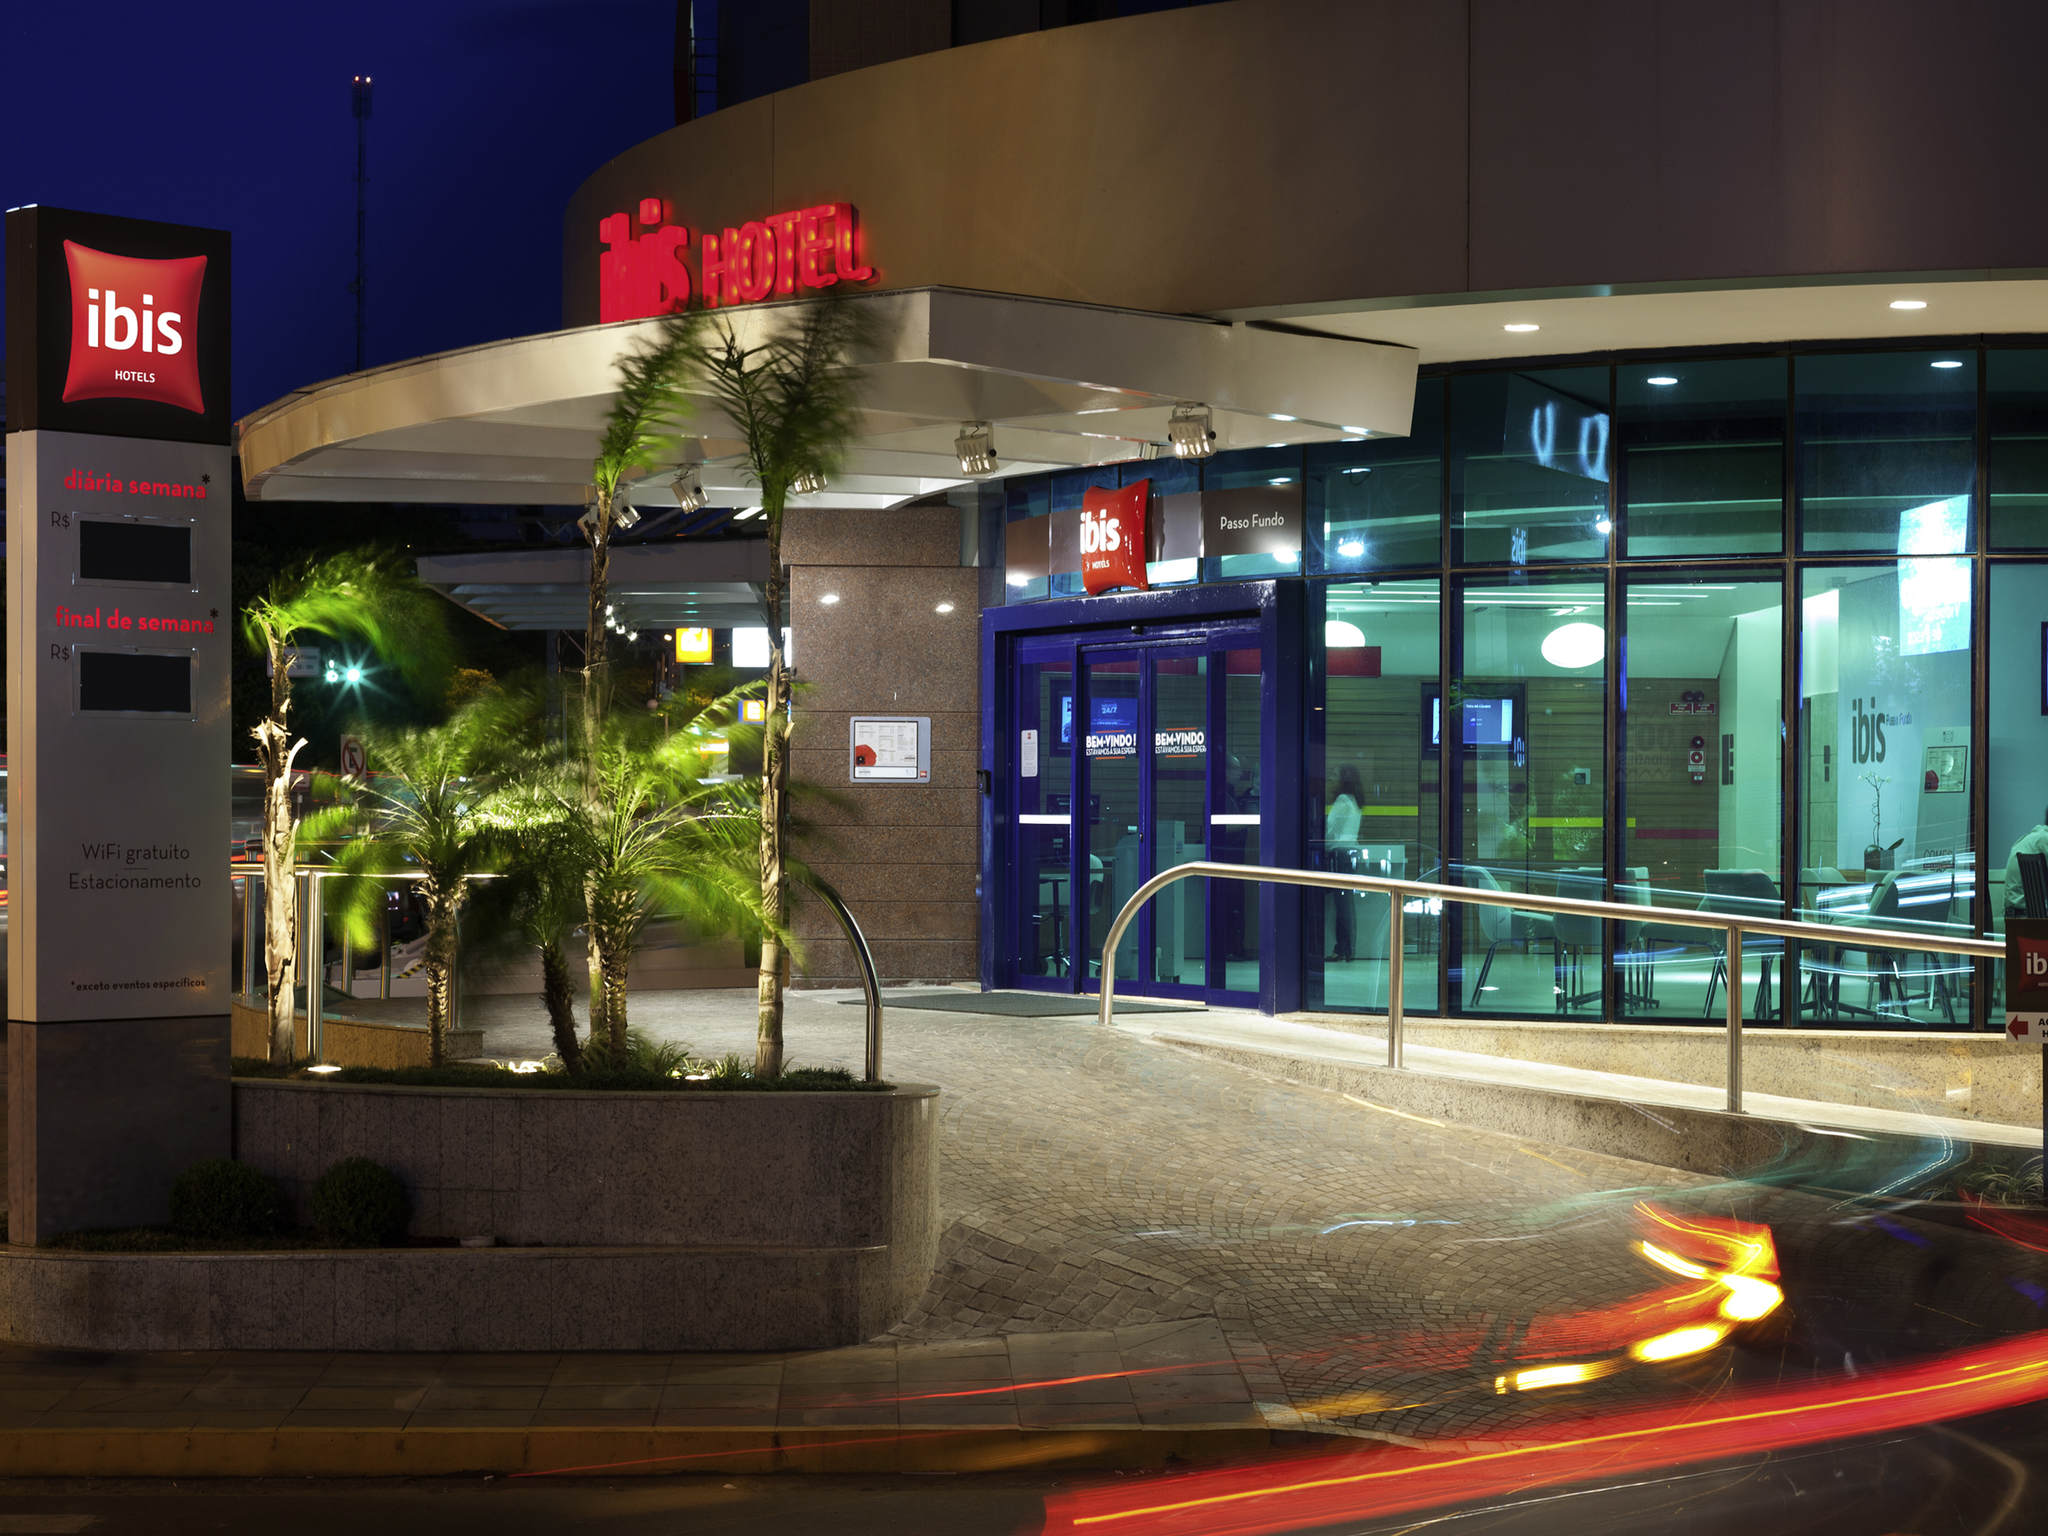 Hotel - ibis Passo Fundo Shopping